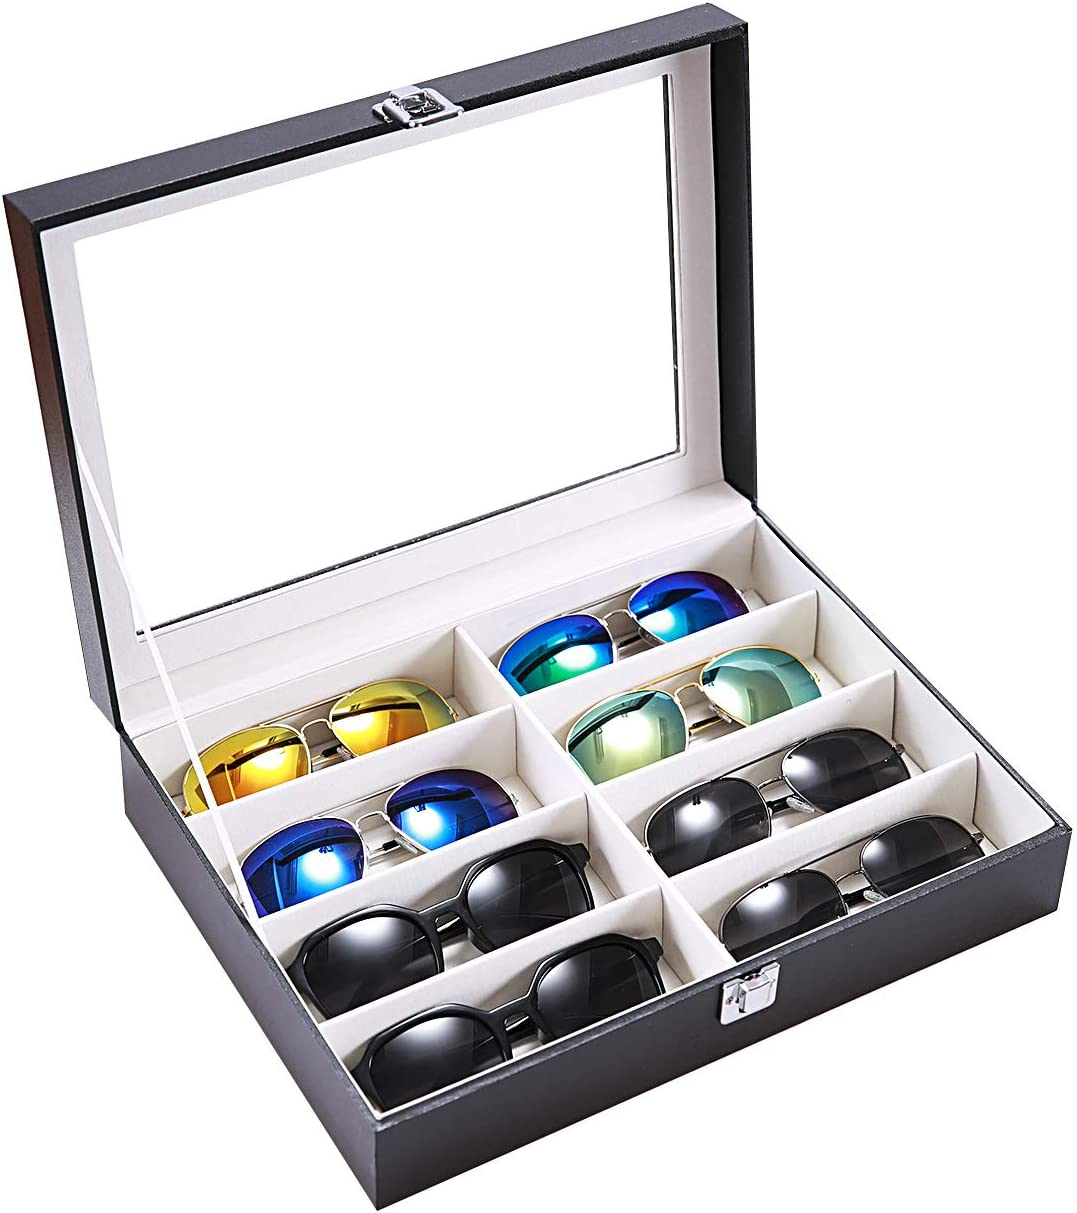 10 Slots Rectangle PU Leather Box Jewelry Display Showcase Organizer Holder